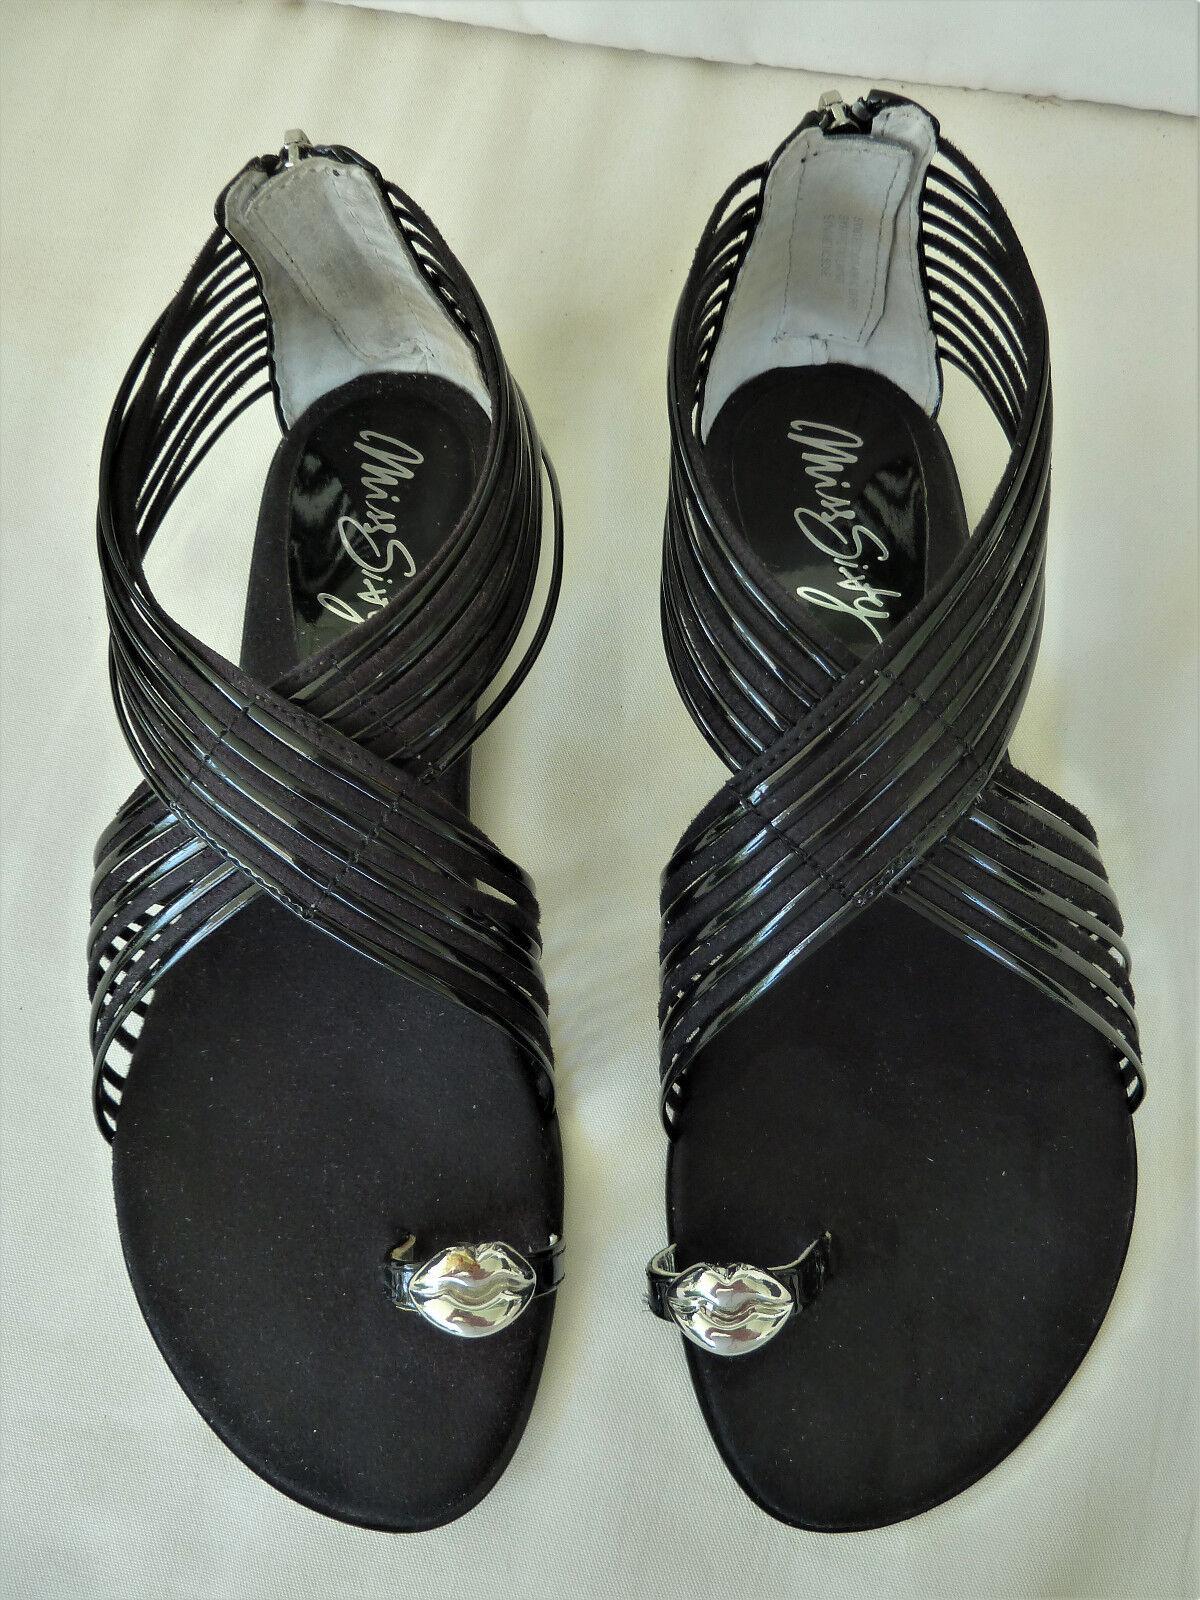 MISS SIXTY *** Sandalen *** *** Größe 38 *** schwarz *** Sandalen Echtleder 0ce2e5